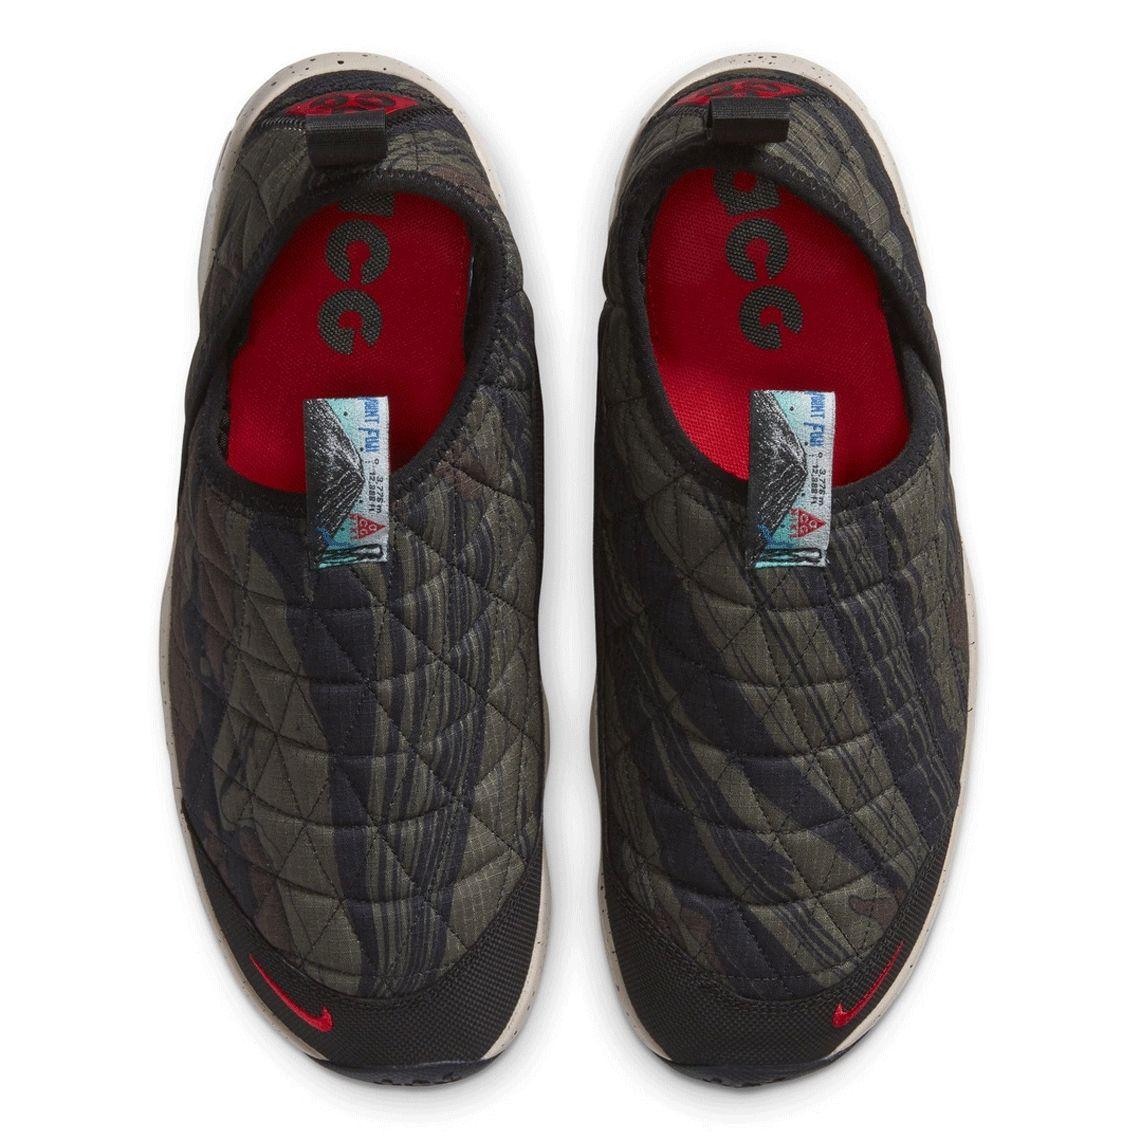 Nike ACG Moc 3.0 Mt Fuji Heel